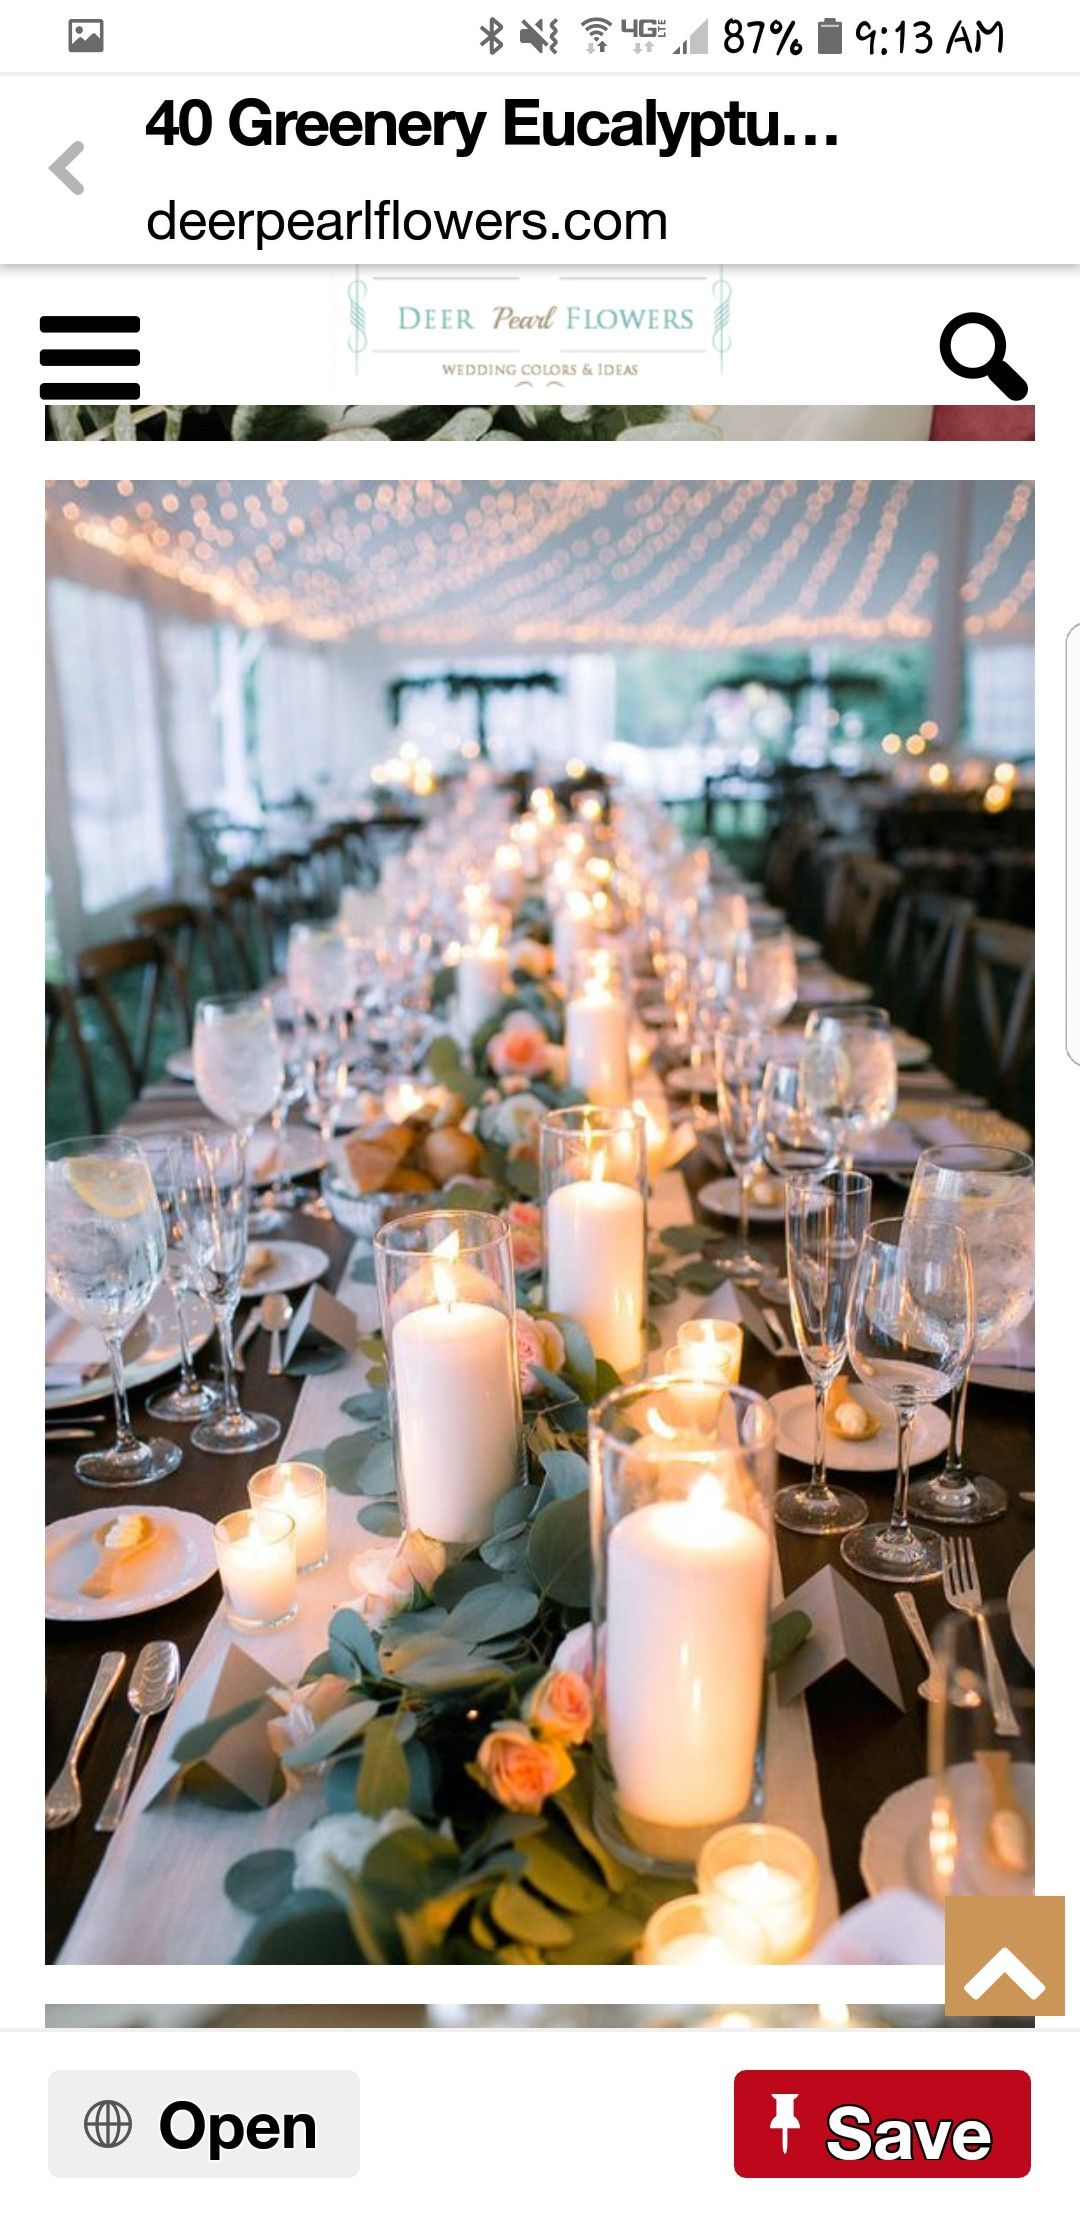 Traditional wedding decor ideas 2018  Pin by Sarah Symington on Wedding ideas in   Pinterest